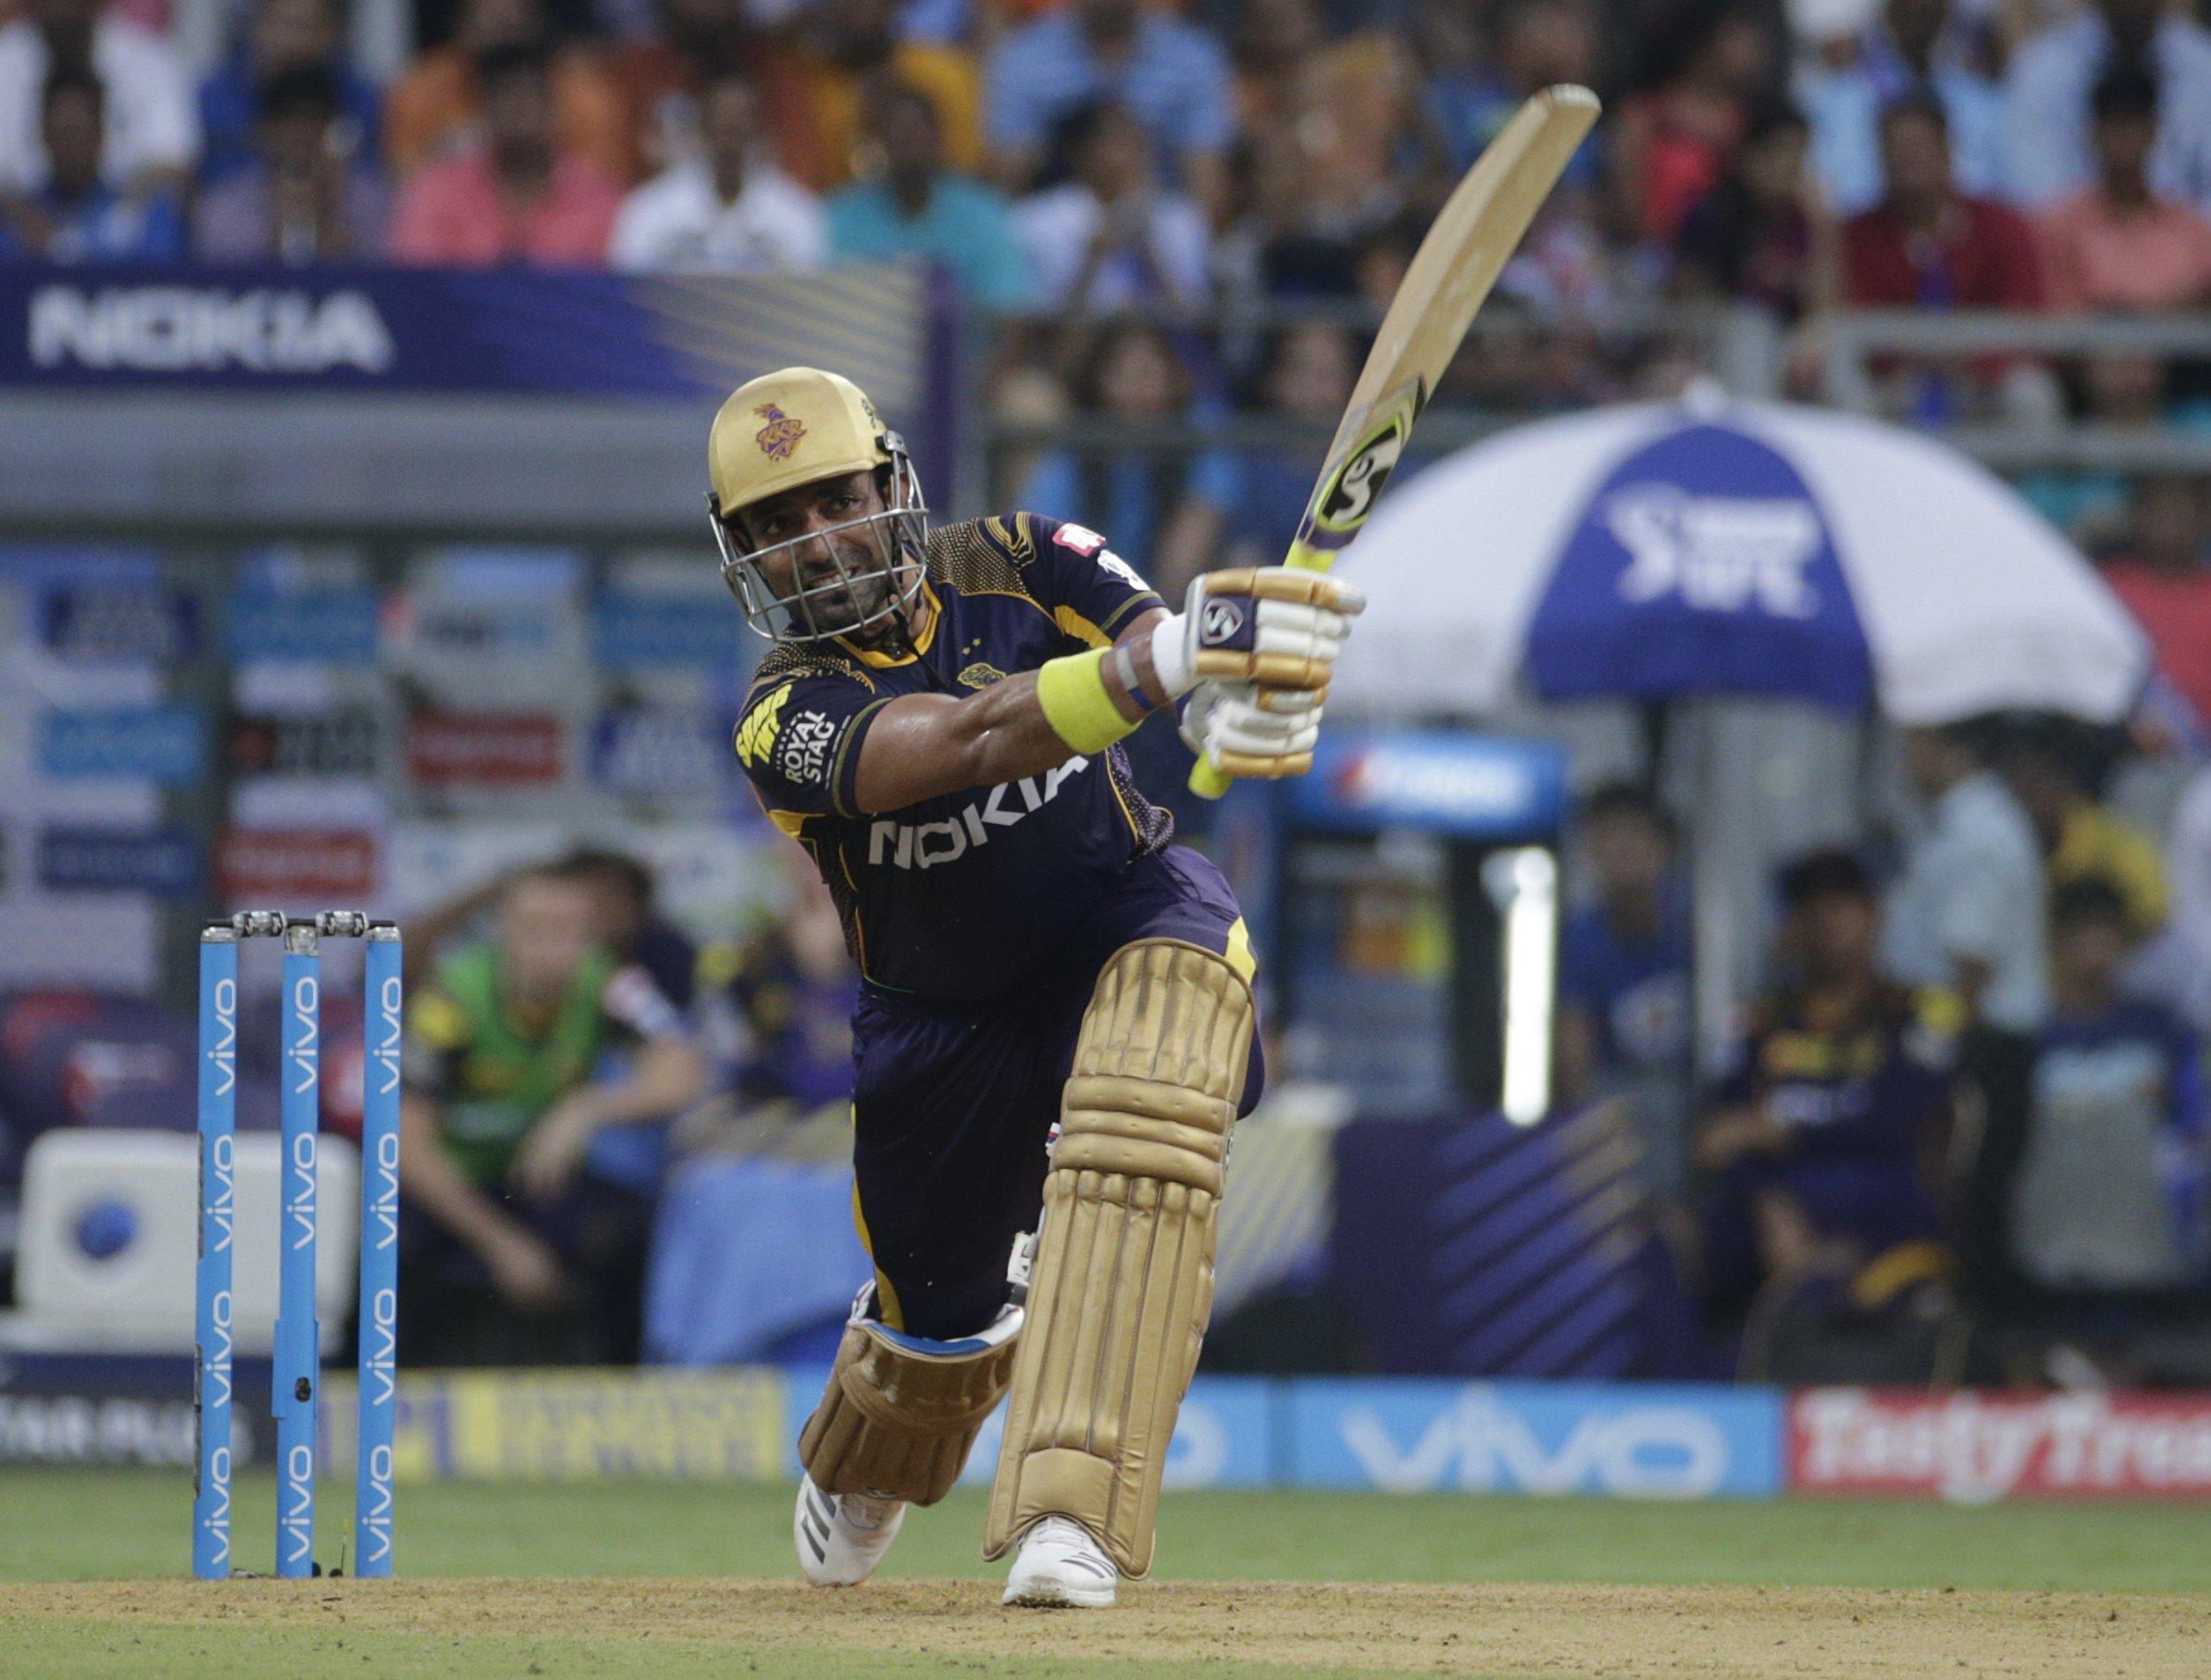 Kolkata Knight Riders v Sunrisers Hyderabad betting preview: Robin Uthappa and Dinesh Karthik worth following in IPL clash